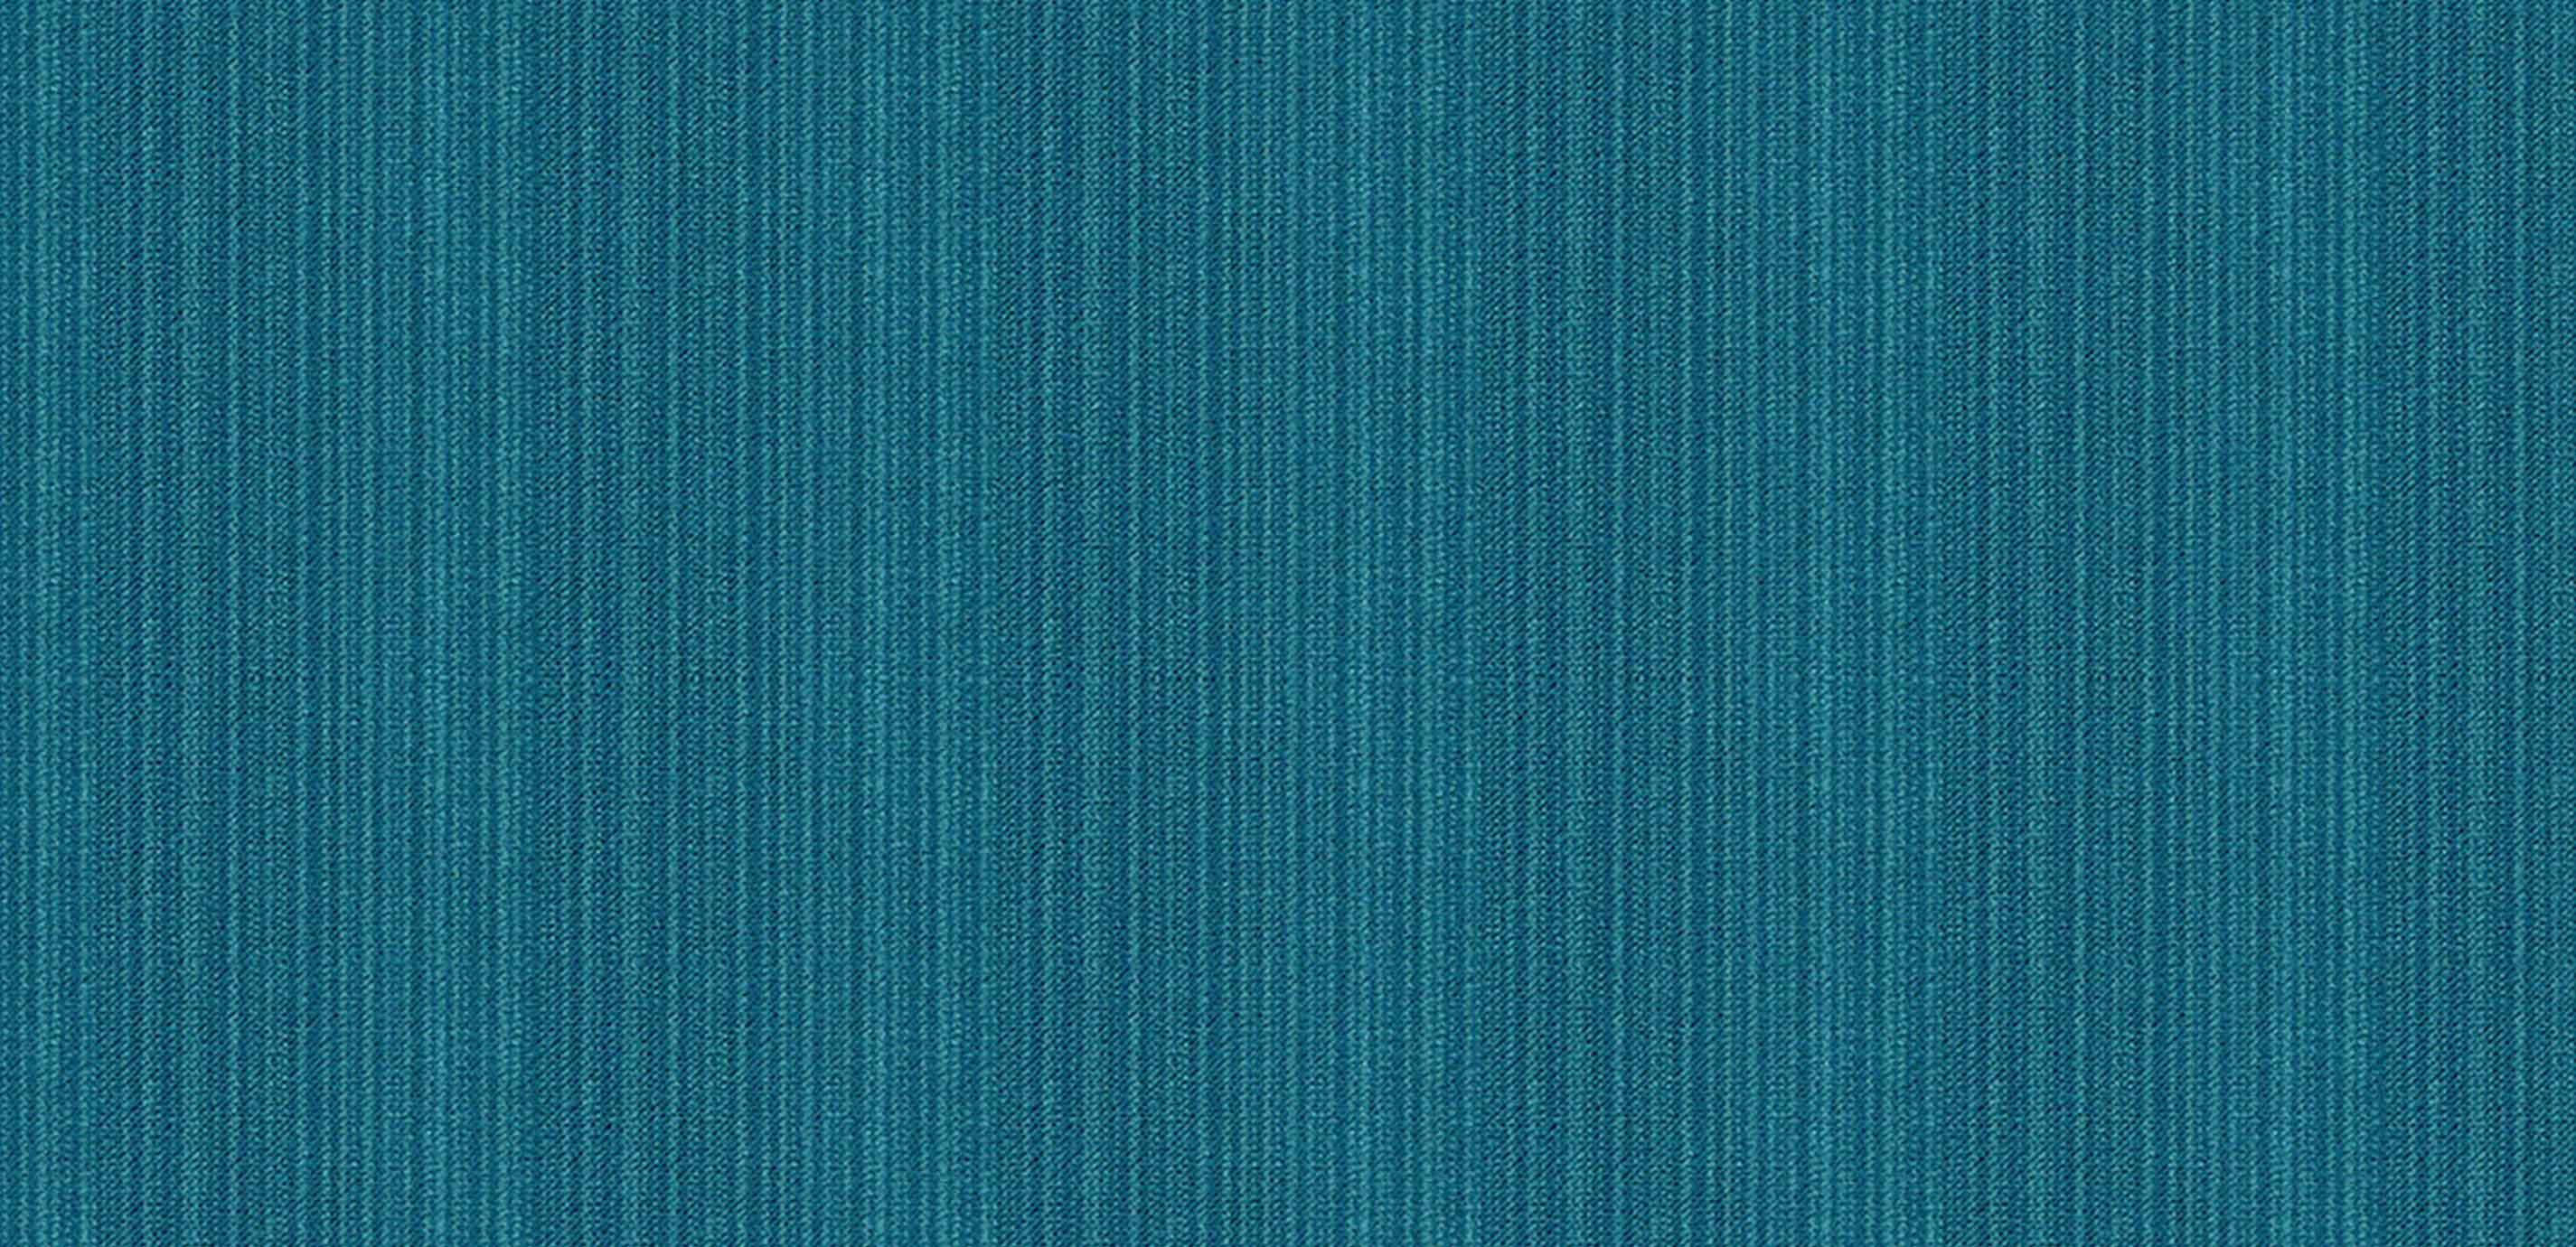 Miraculous Keegan Teal Fabric Fabrics Ethan Allen Bralicious Painted Fabric Chair Ideas Braliciousco